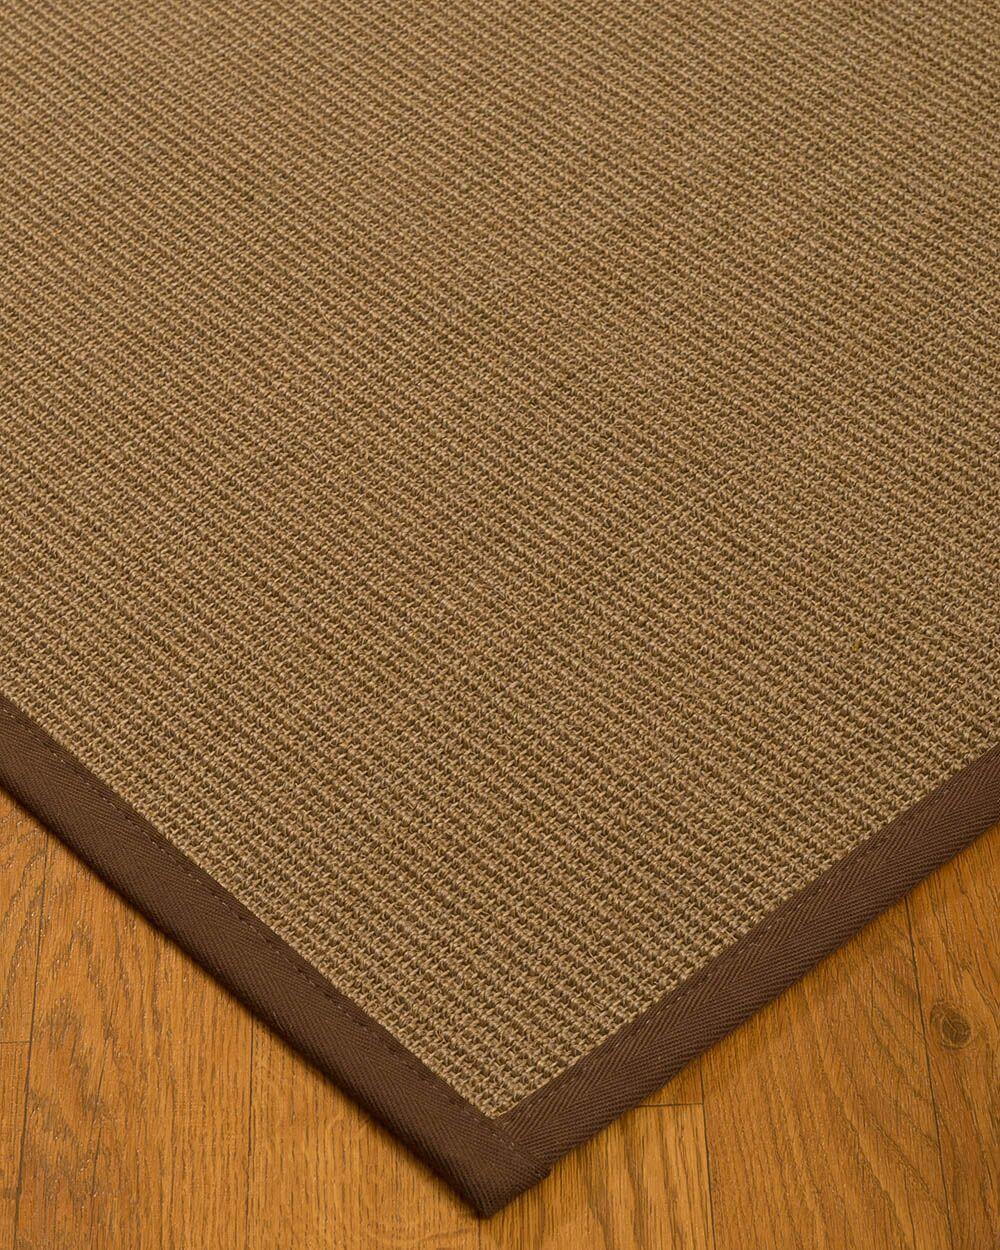 Chadbourne Hand-Woven Beige Area Rug Rug Size: Rectangle 6' x 9'